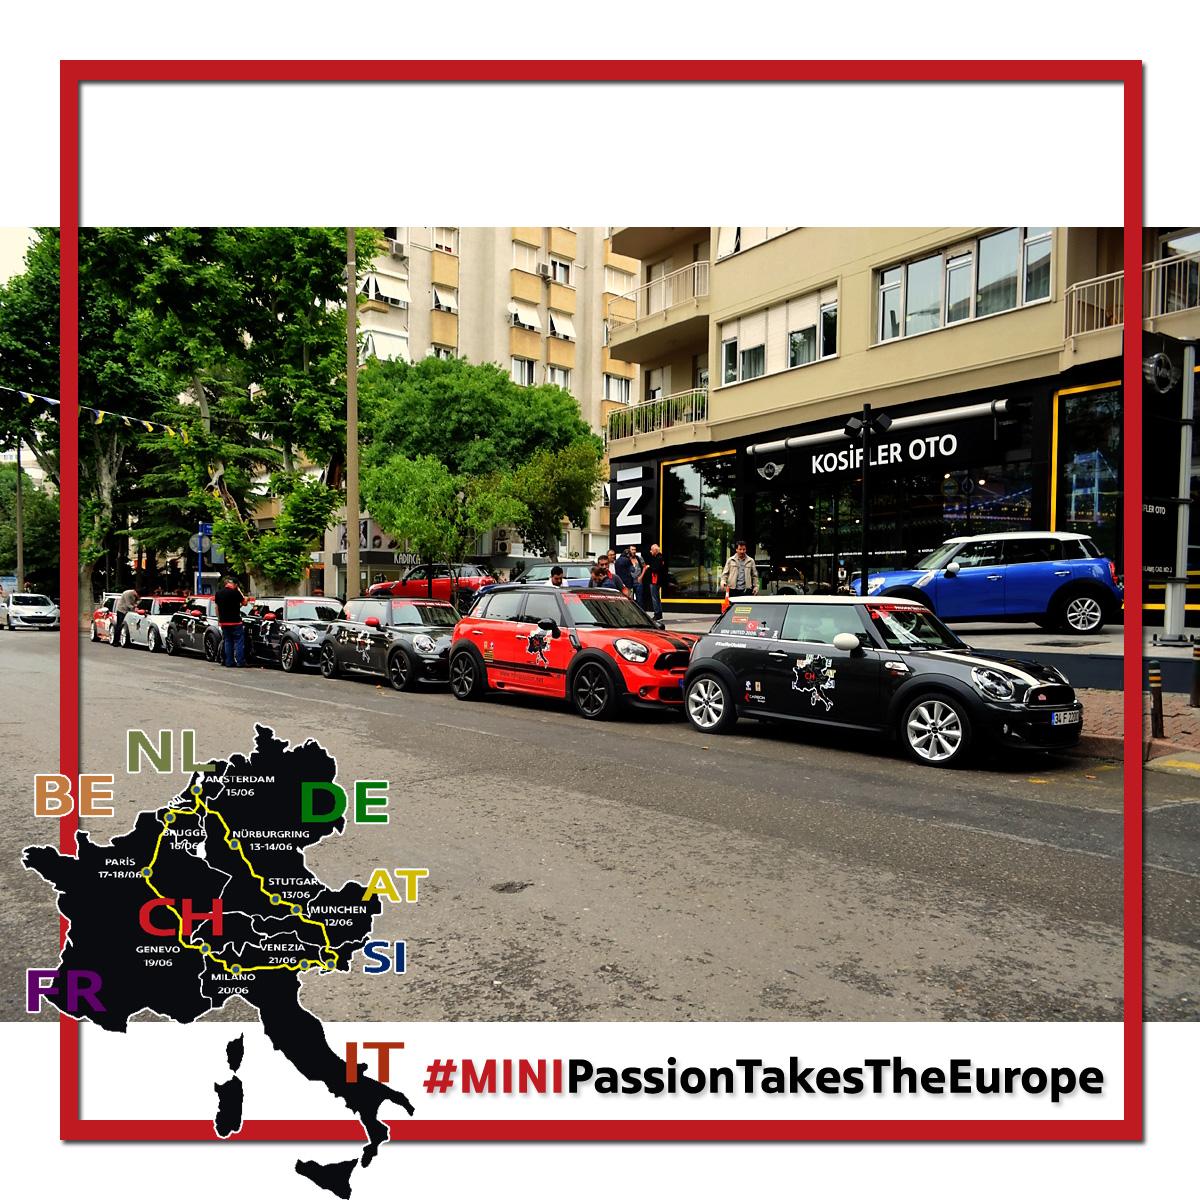 MINIPassionTakesThEurope1_tonemapped